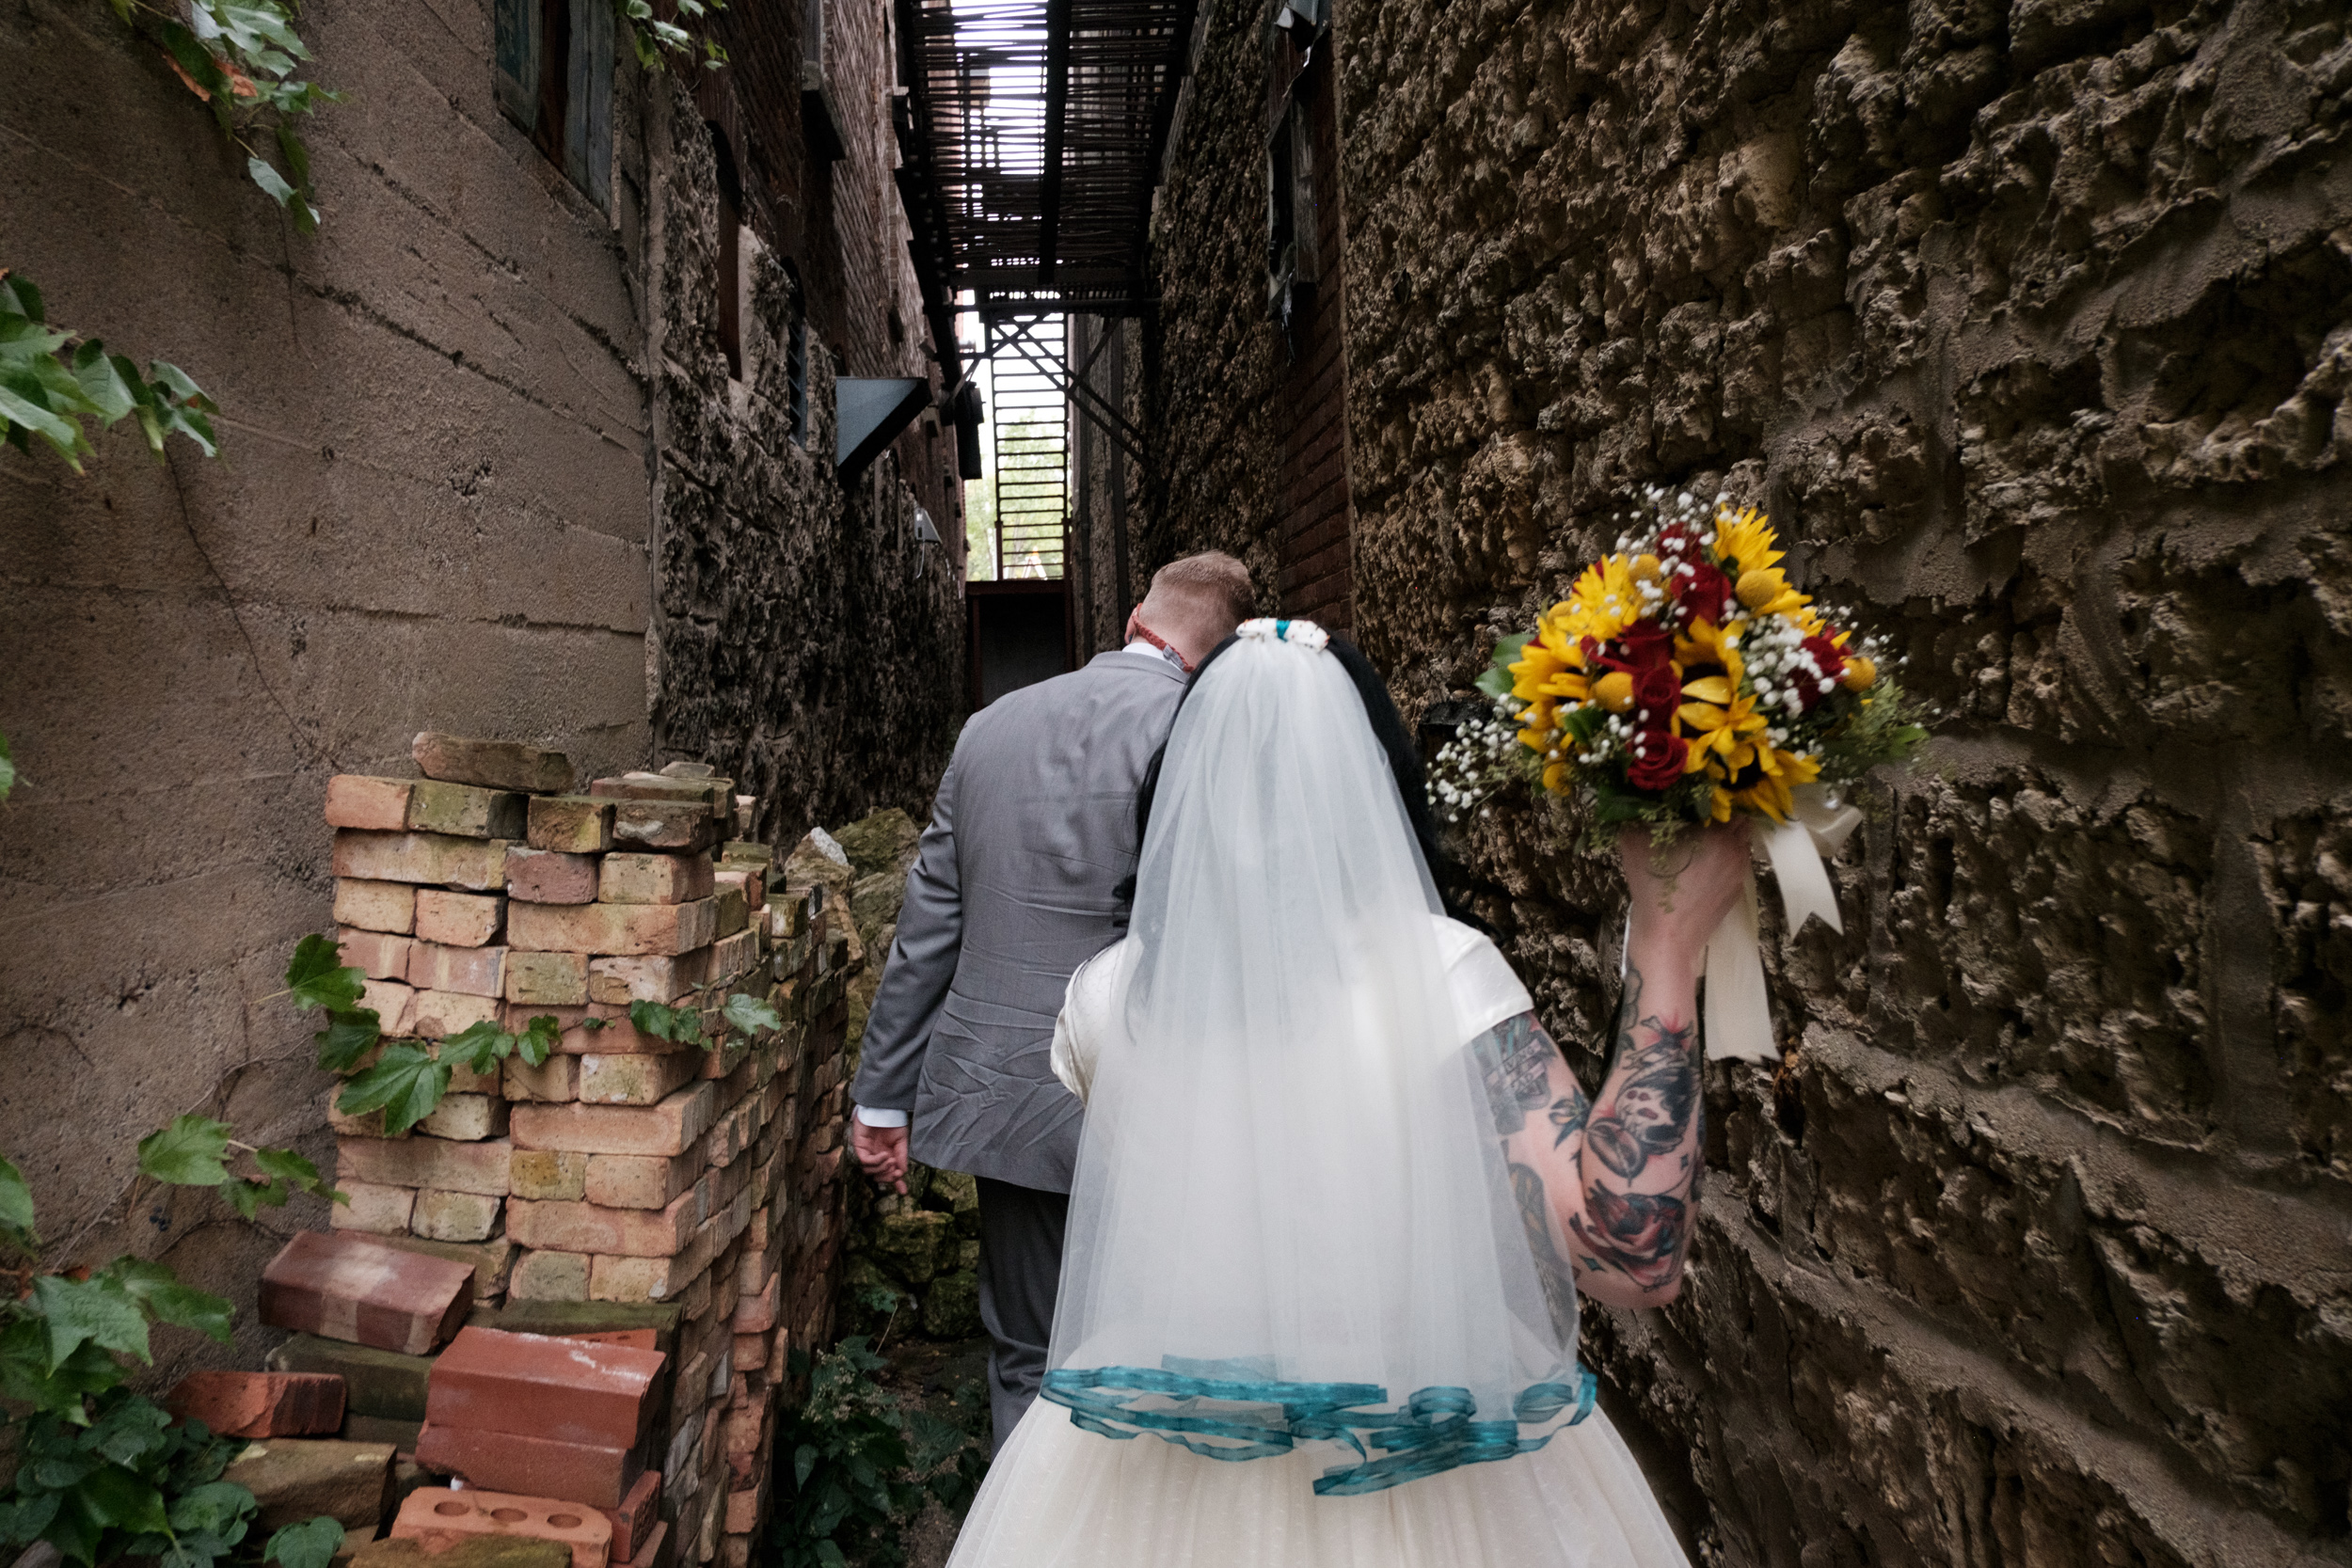 Christian & Sarah wedding photography by Brian milo-194.jpg